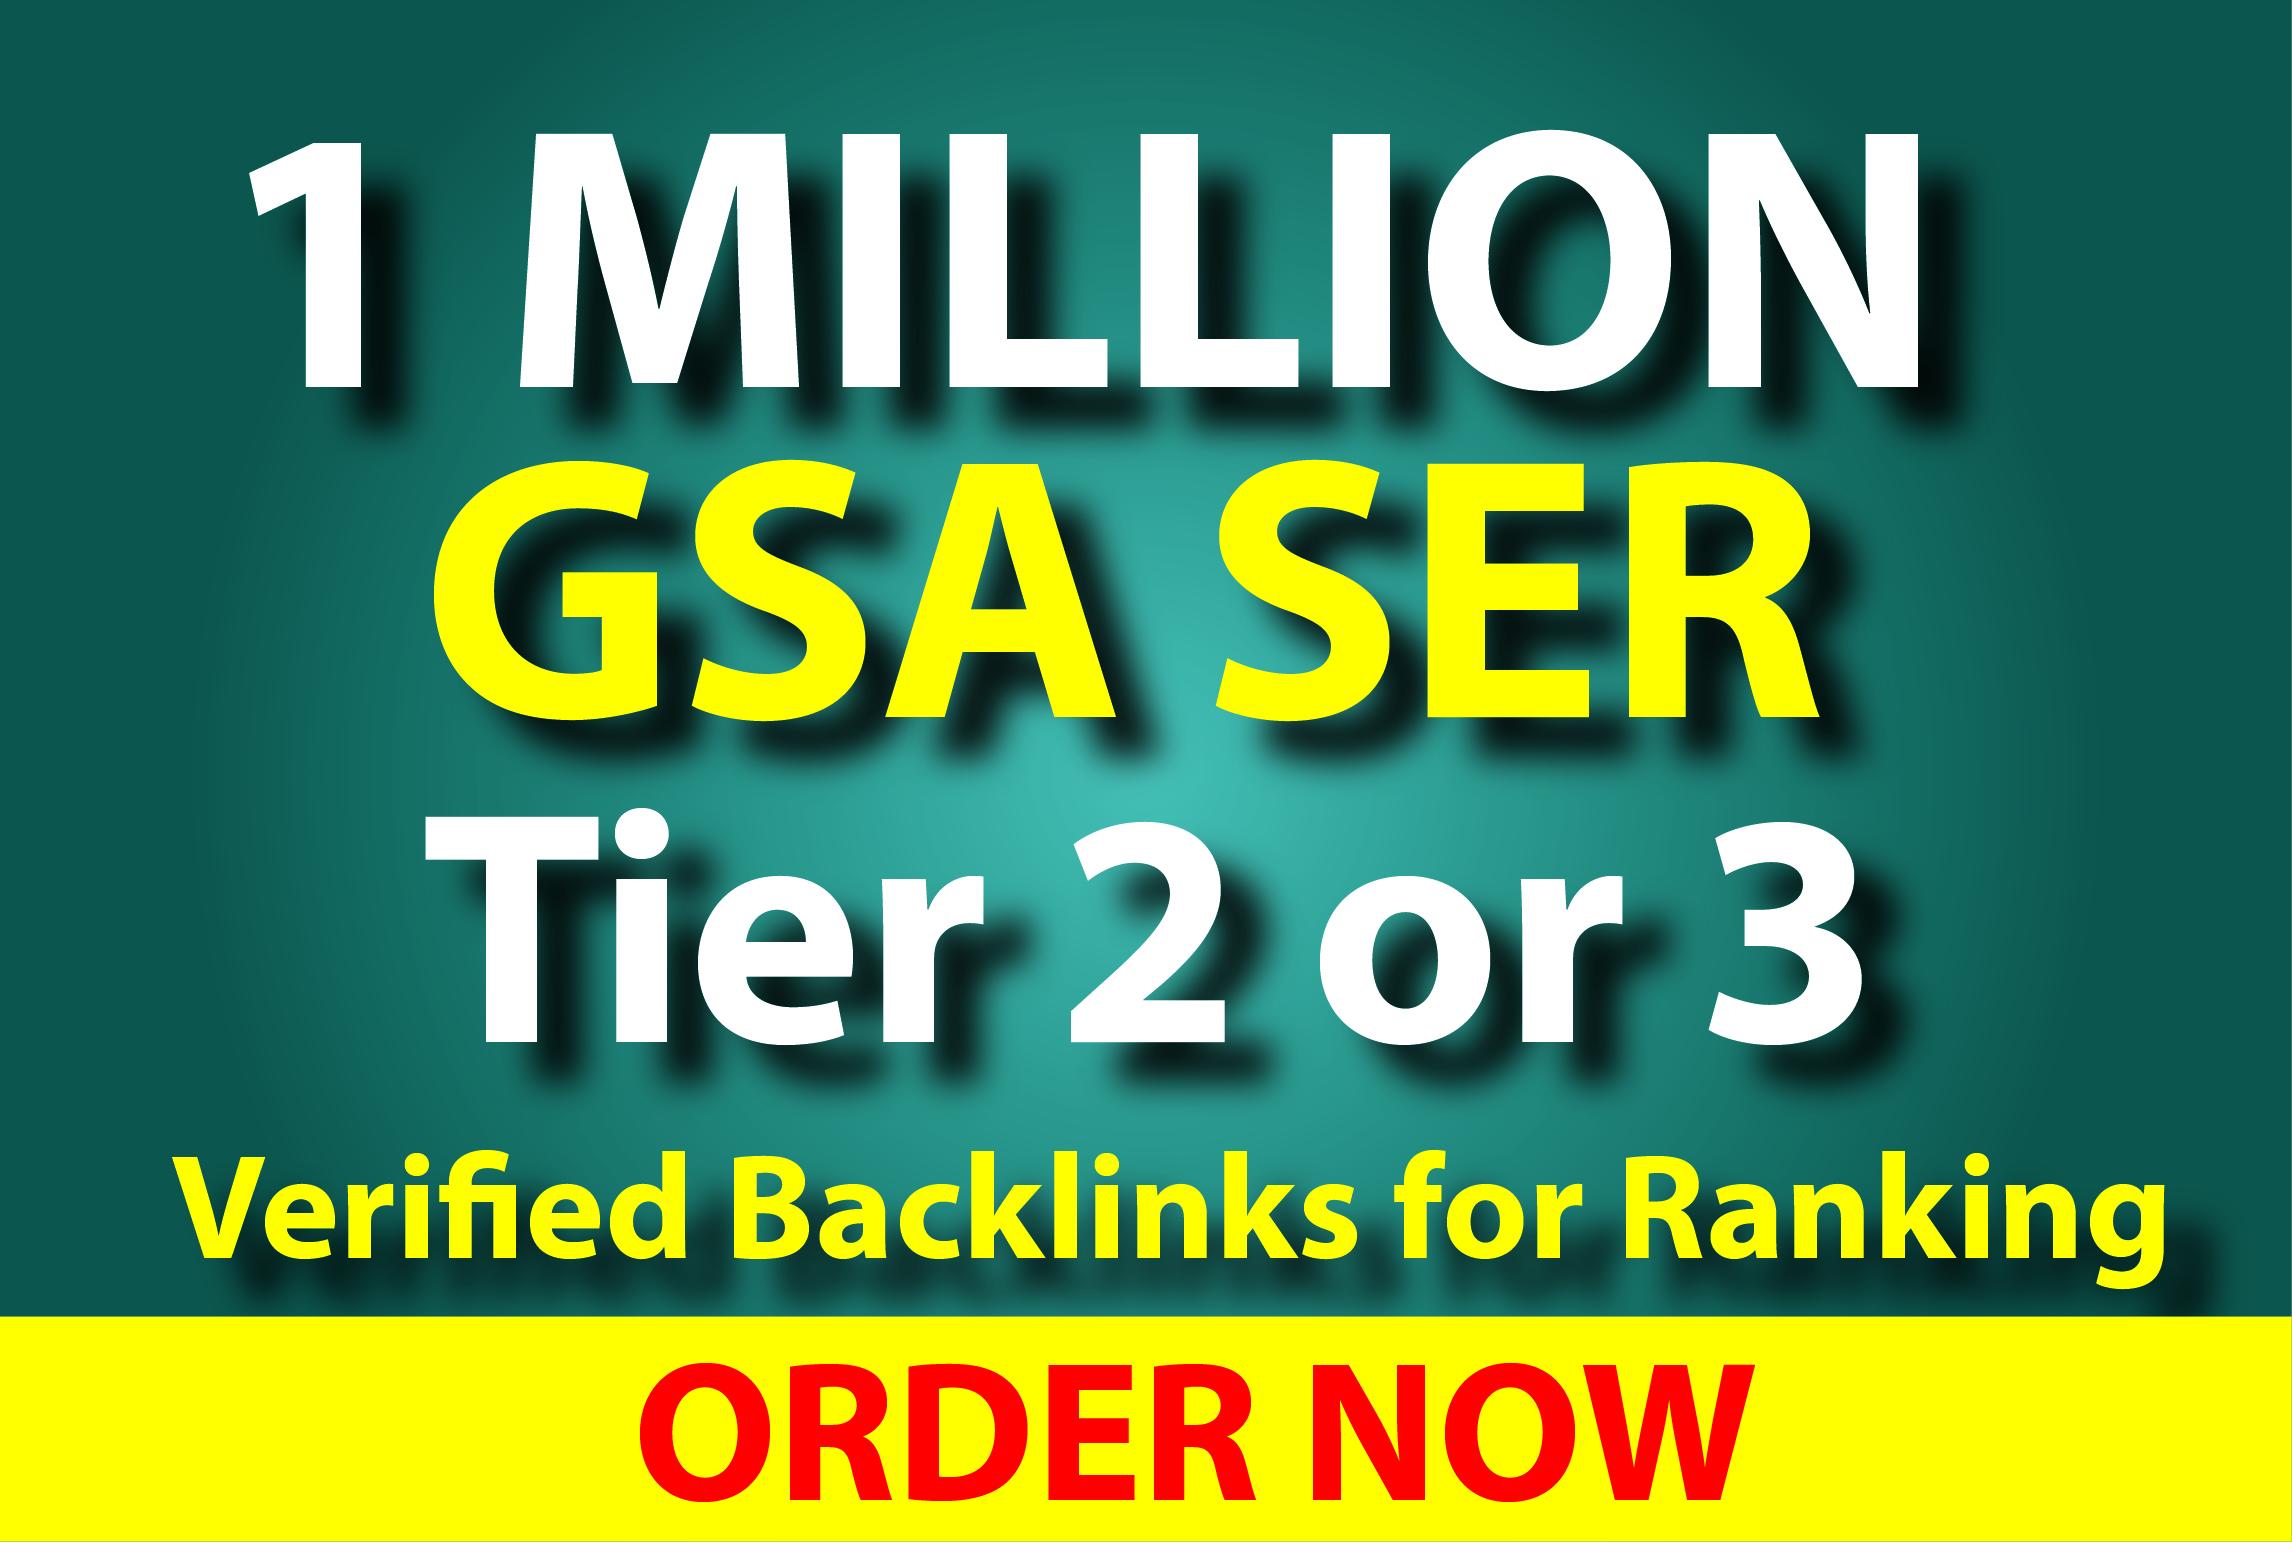 1 Million GSA SER Tier 2 or 3 Verified Backlinks for Ranking